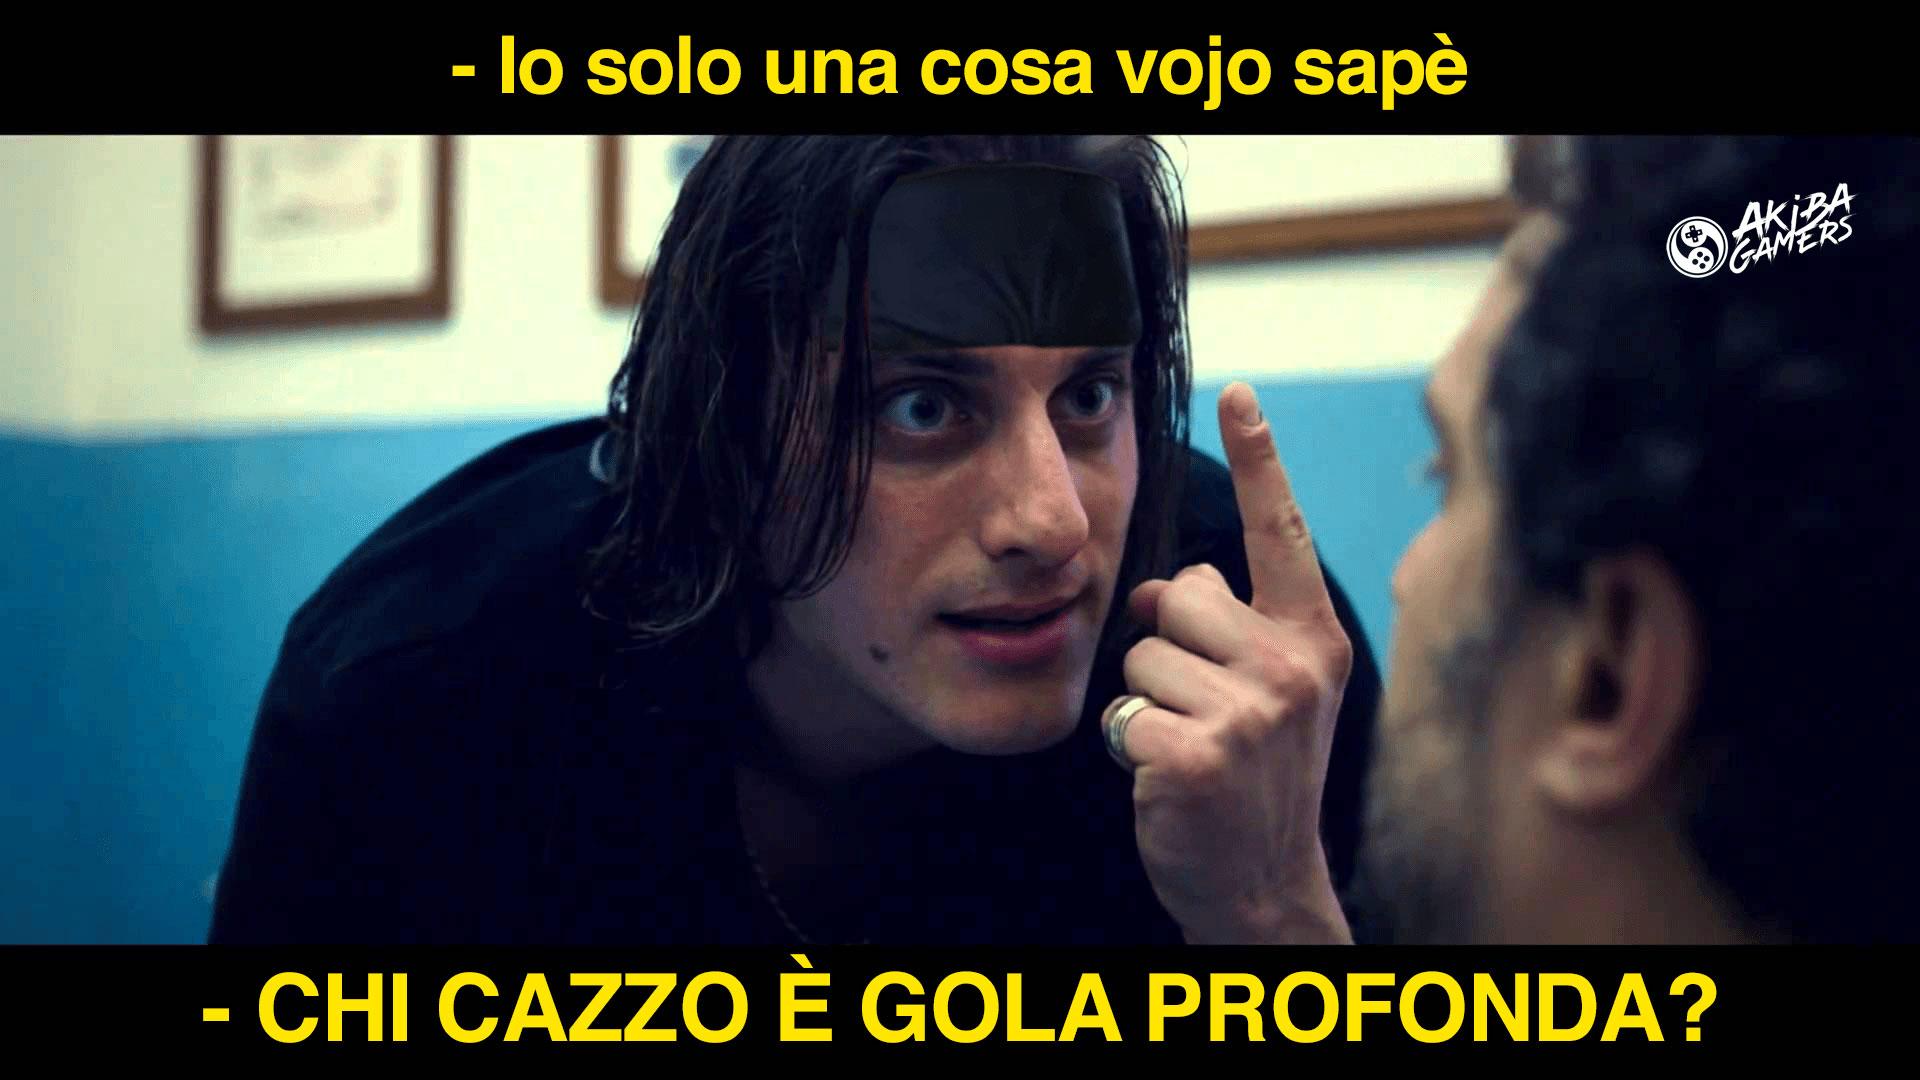 Luca Marinelli meme